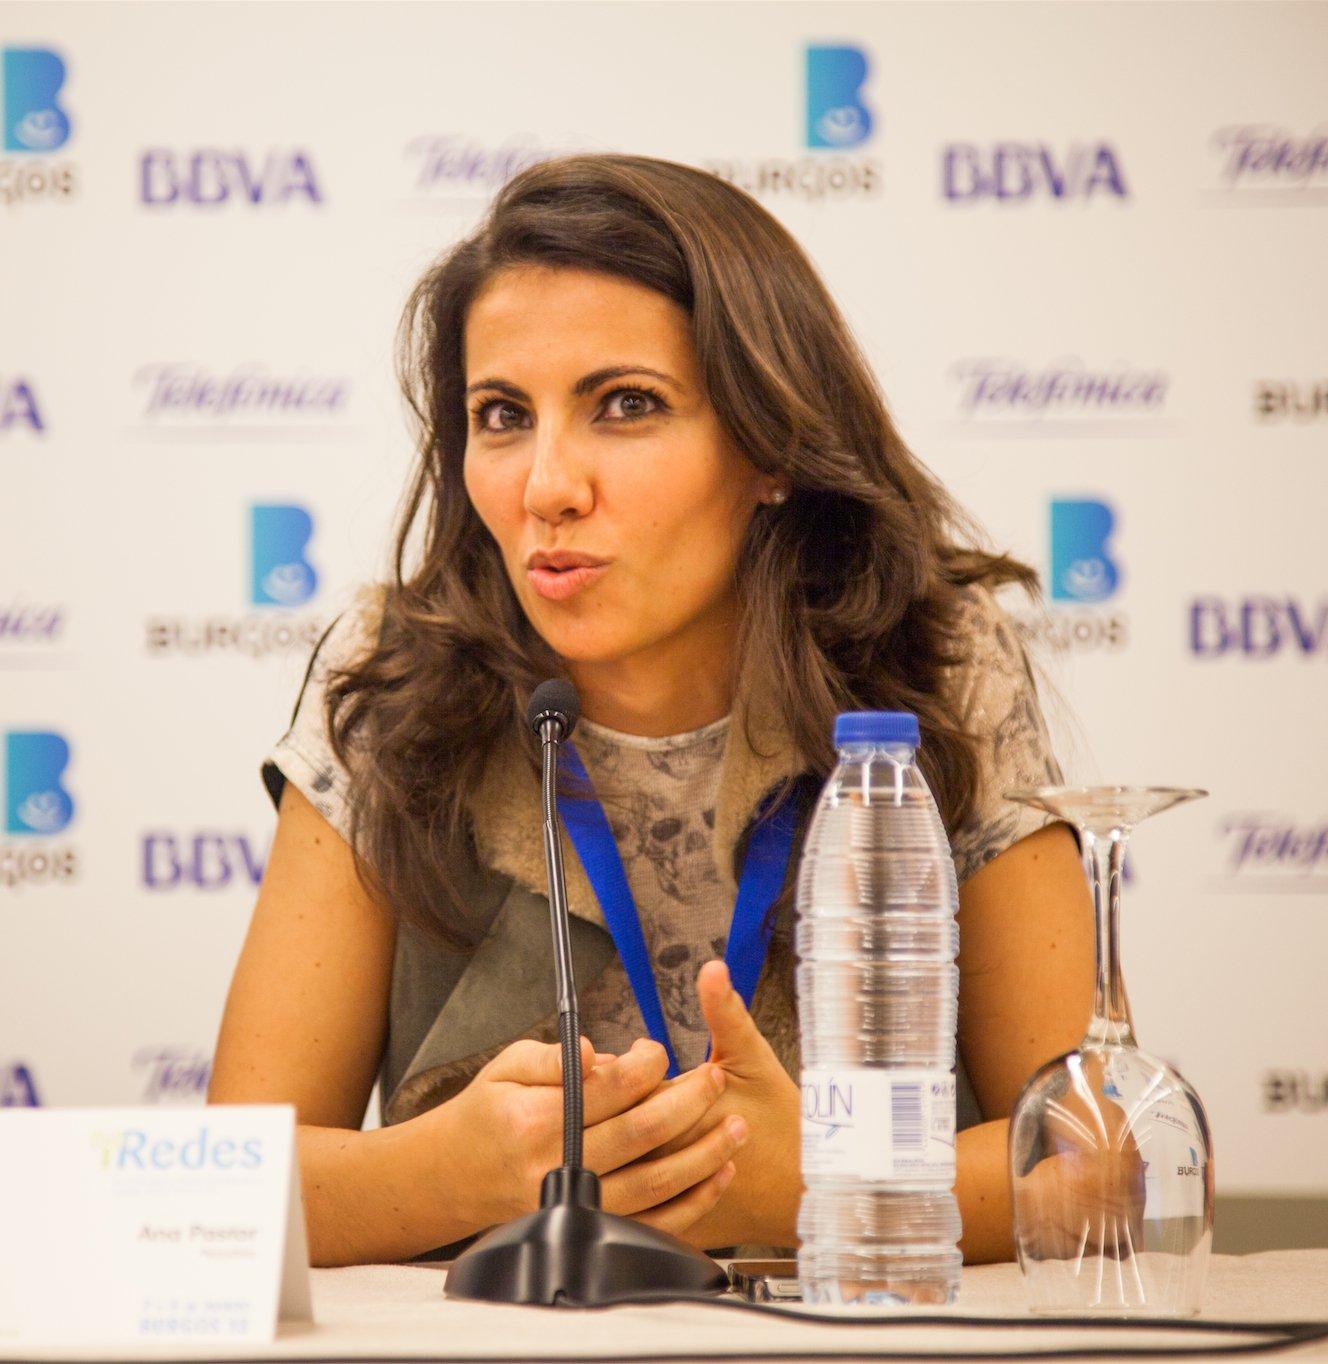 Periodista Ana Pastor asistió al evento iRedes en 2013. | Foto: Wikimedia